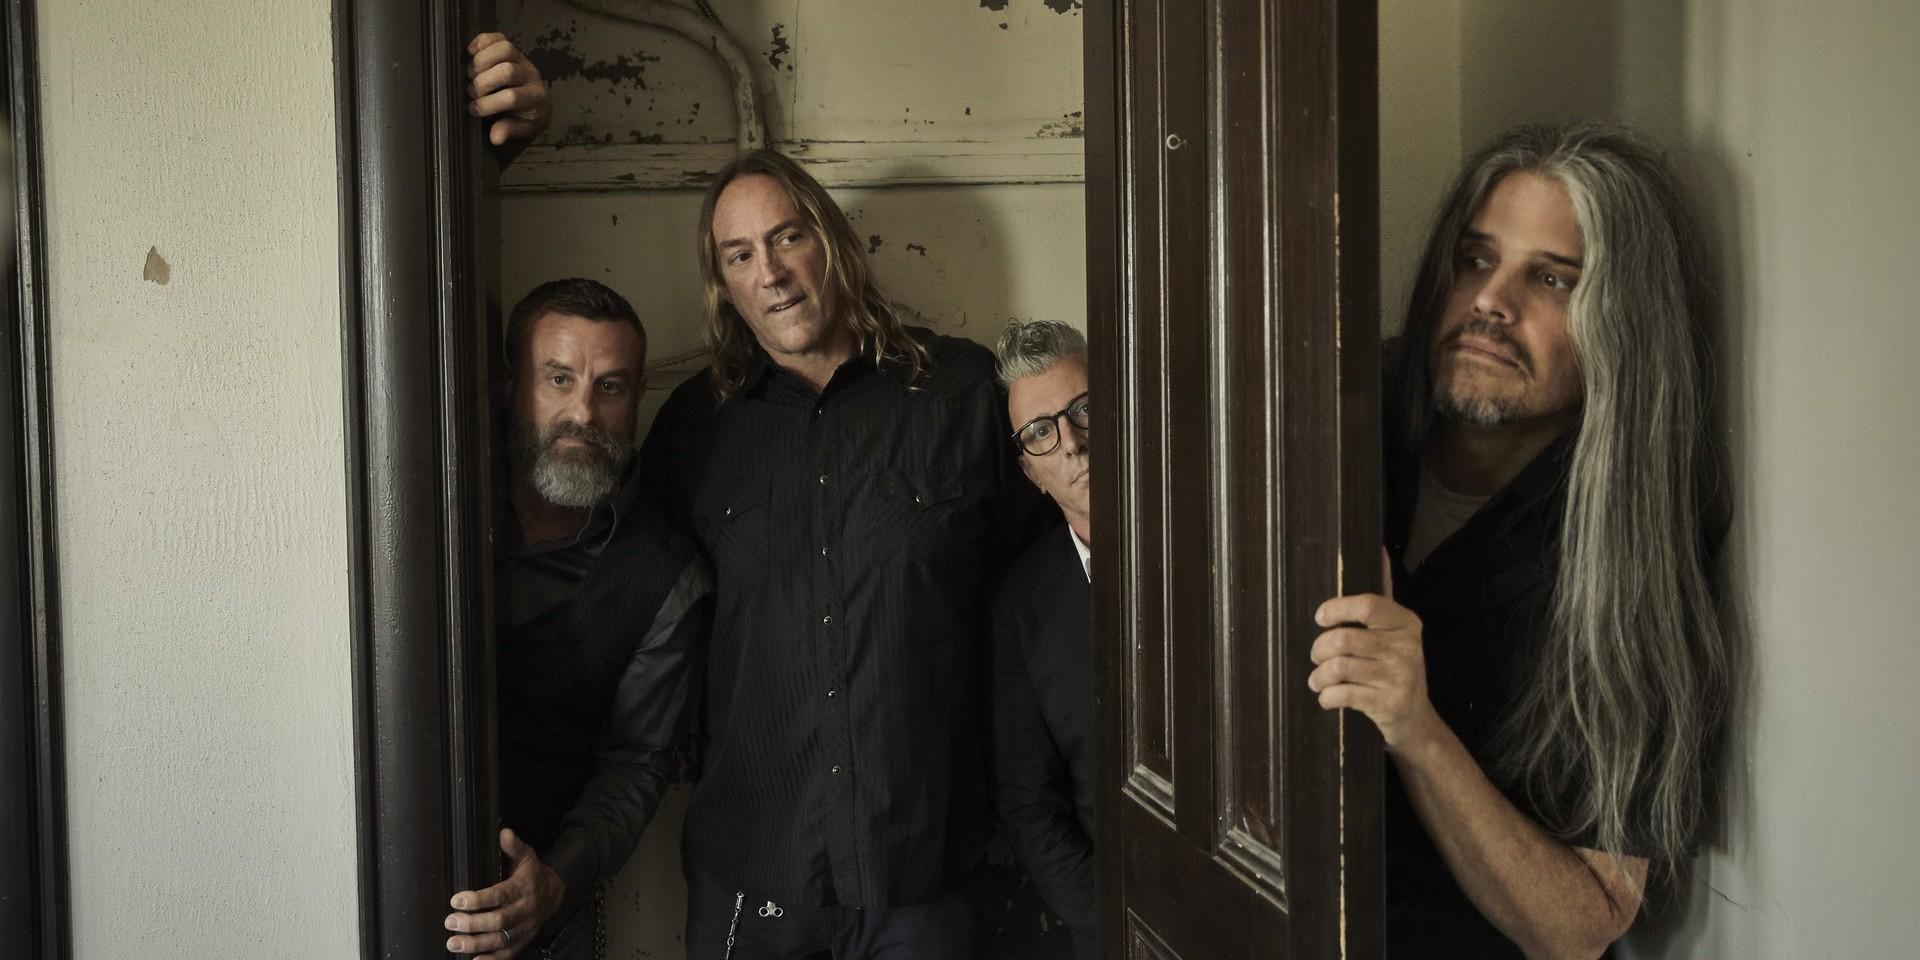 TOOL releases first album in 13 years, Fear Inoculum – listen